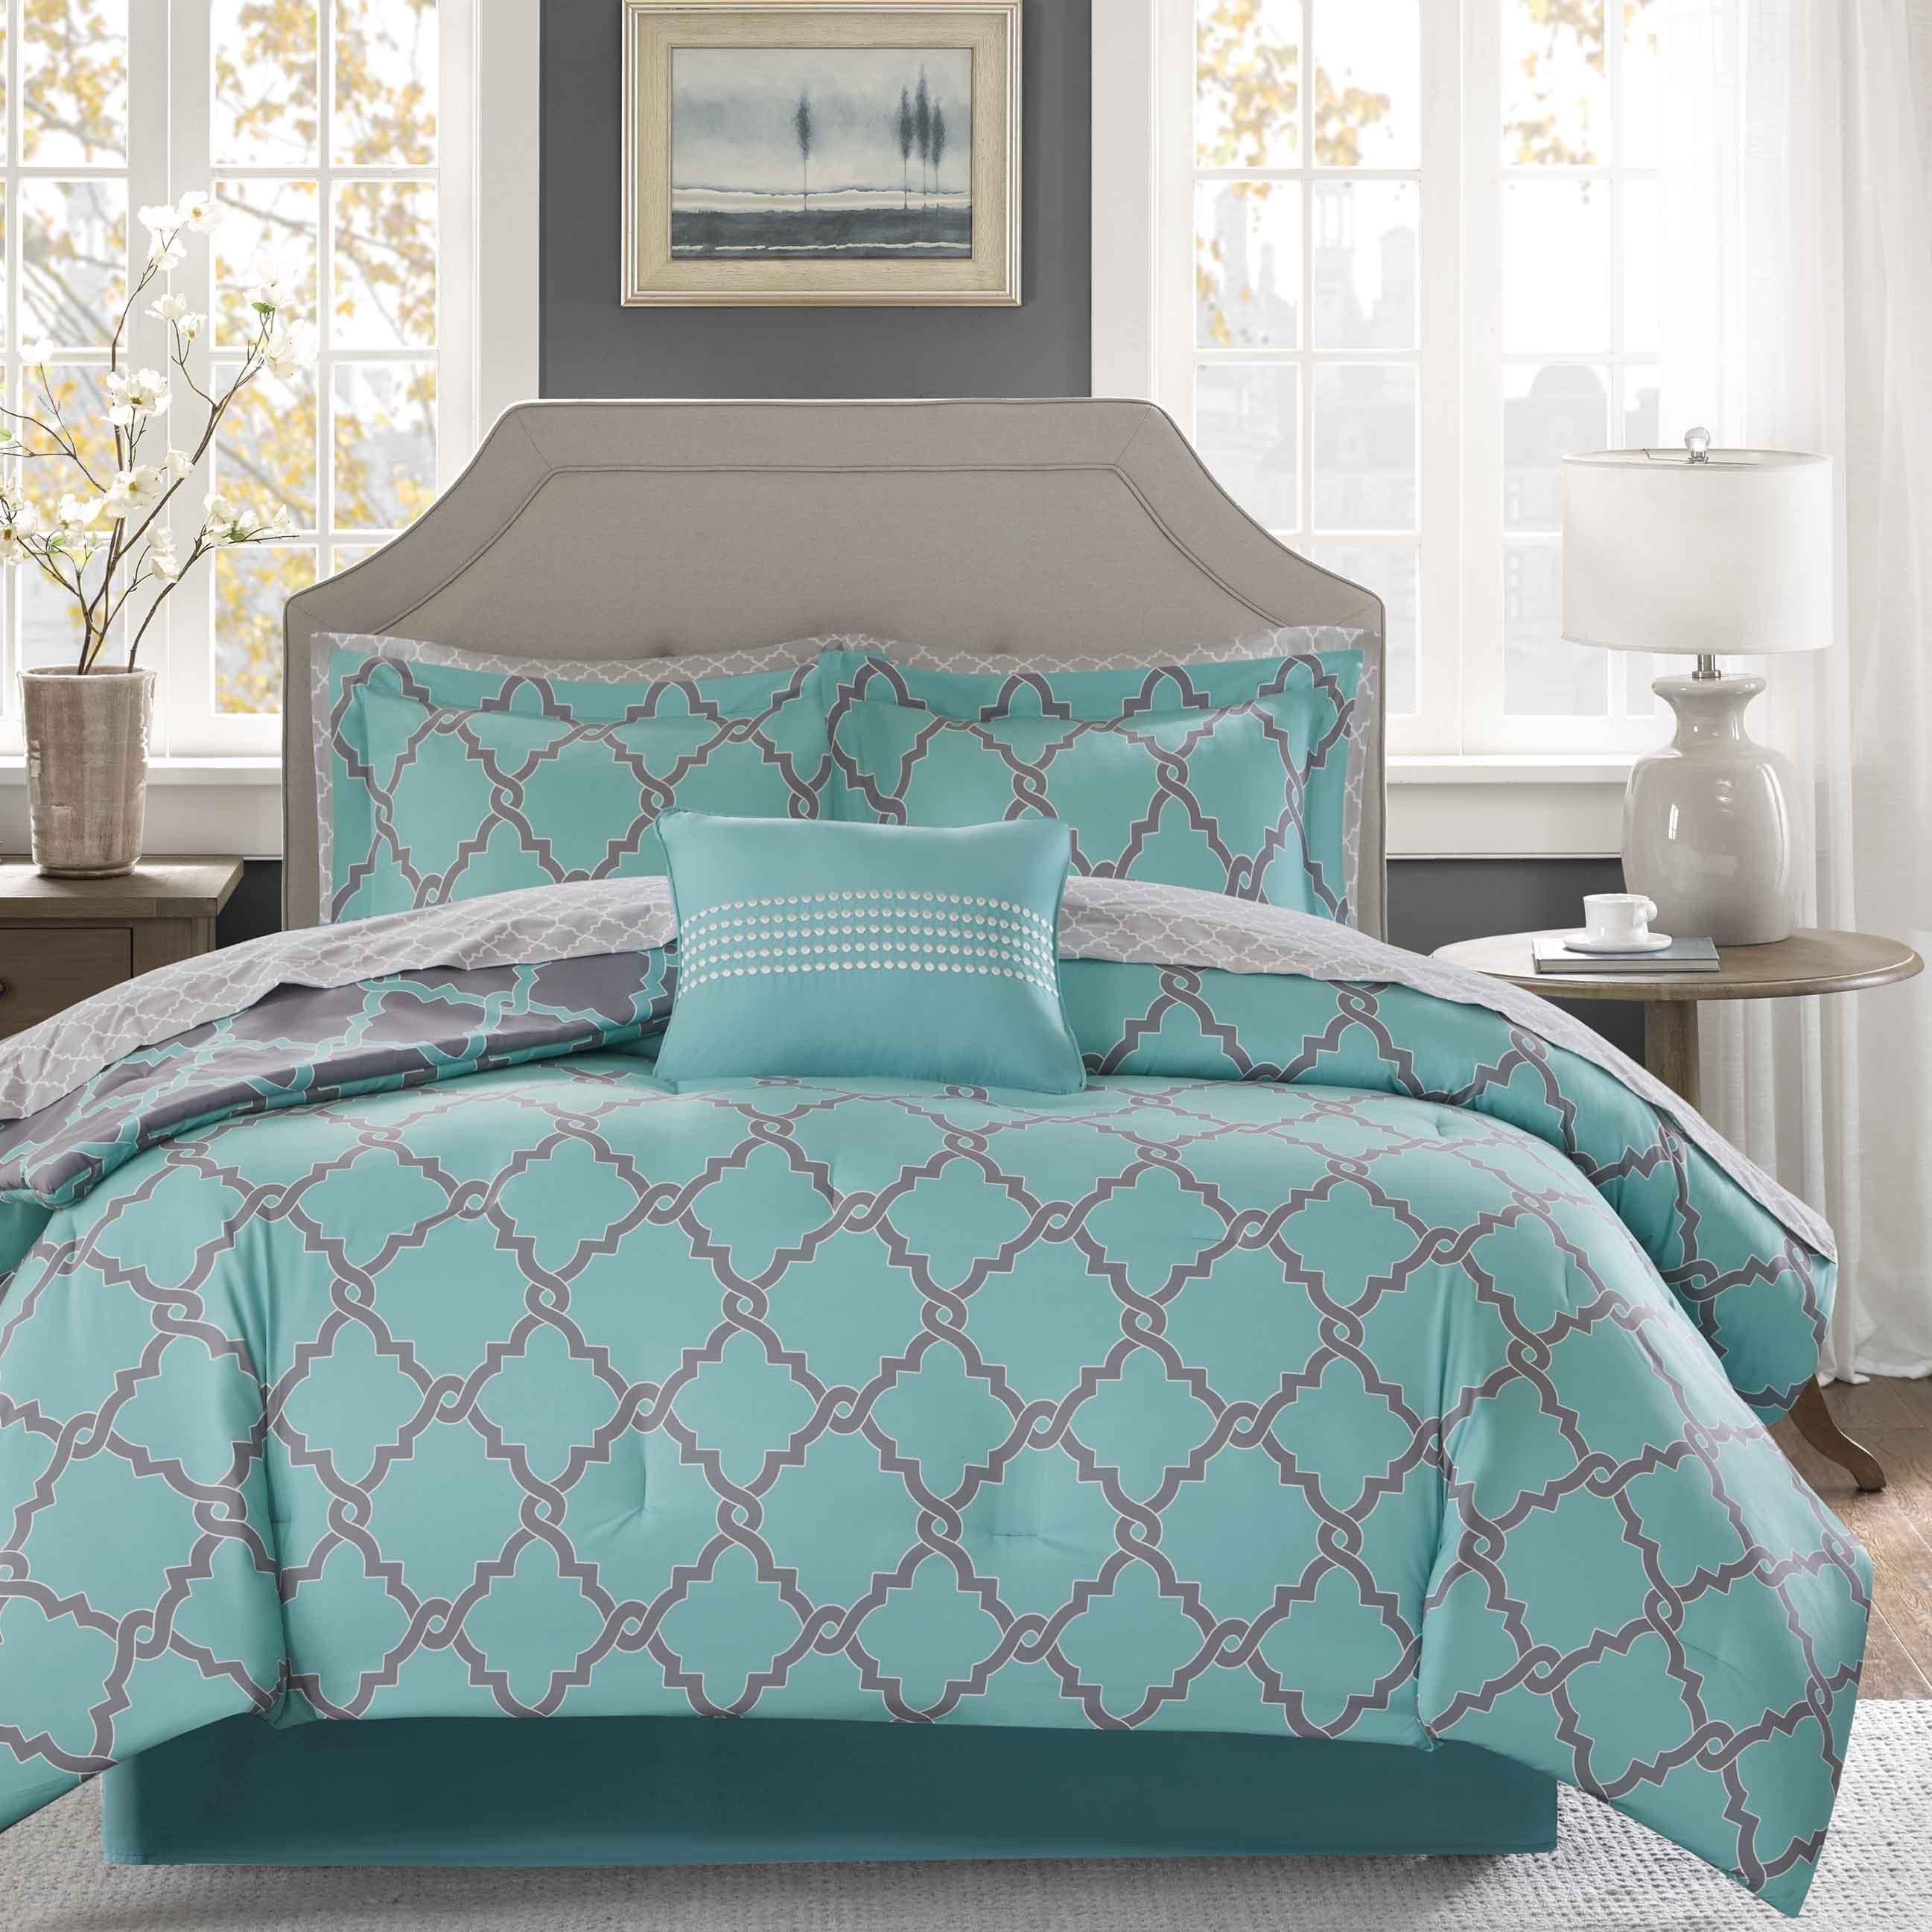 on piece set ravello bath product bedding bed pintuck decor overstock lush shipping free comforter com